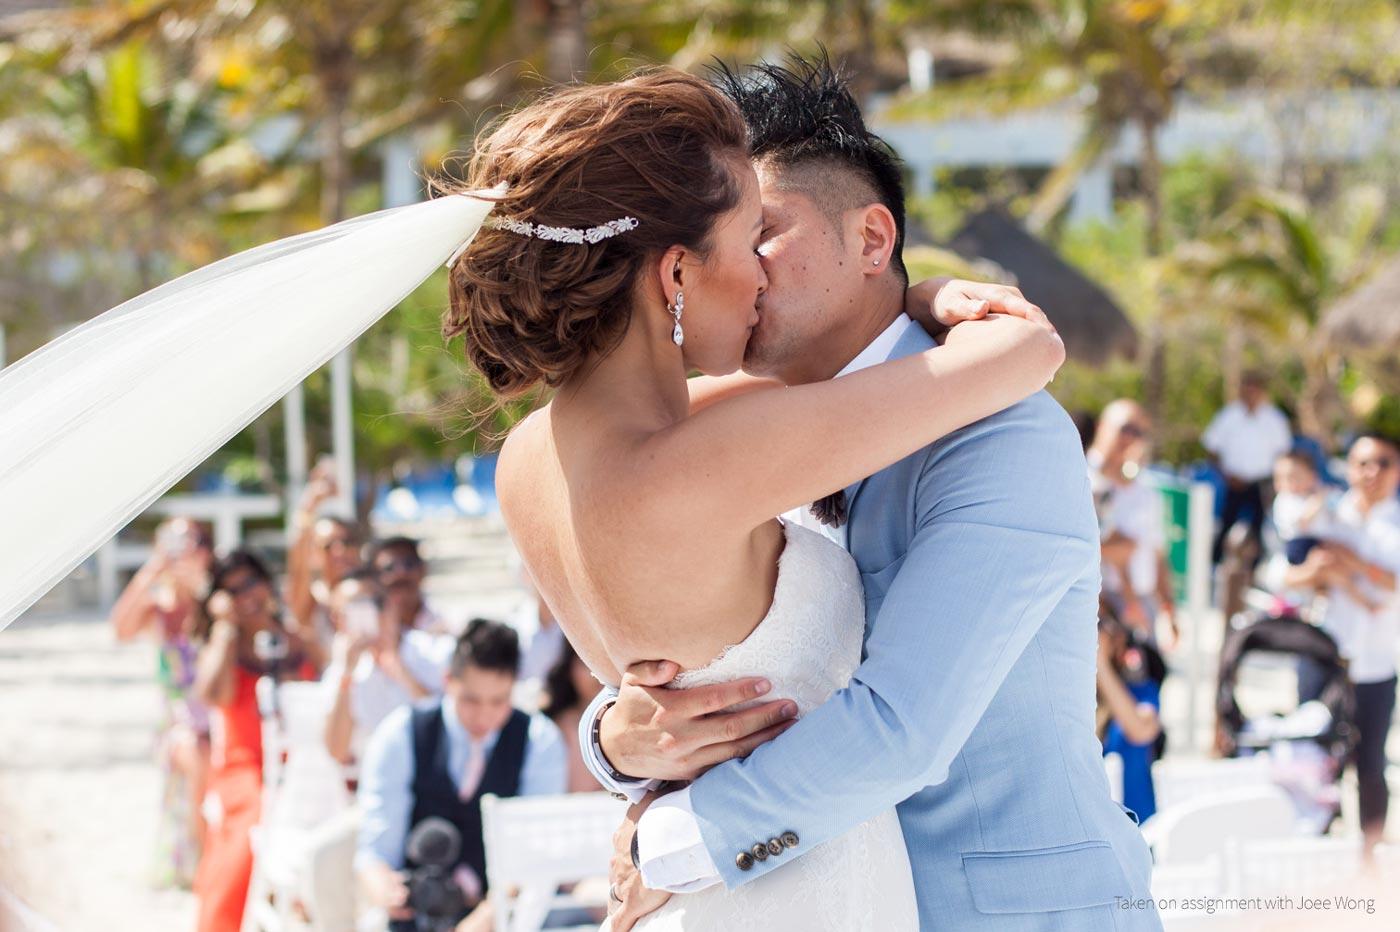 joeewong-heju-jessicahoang-mexico-wedding